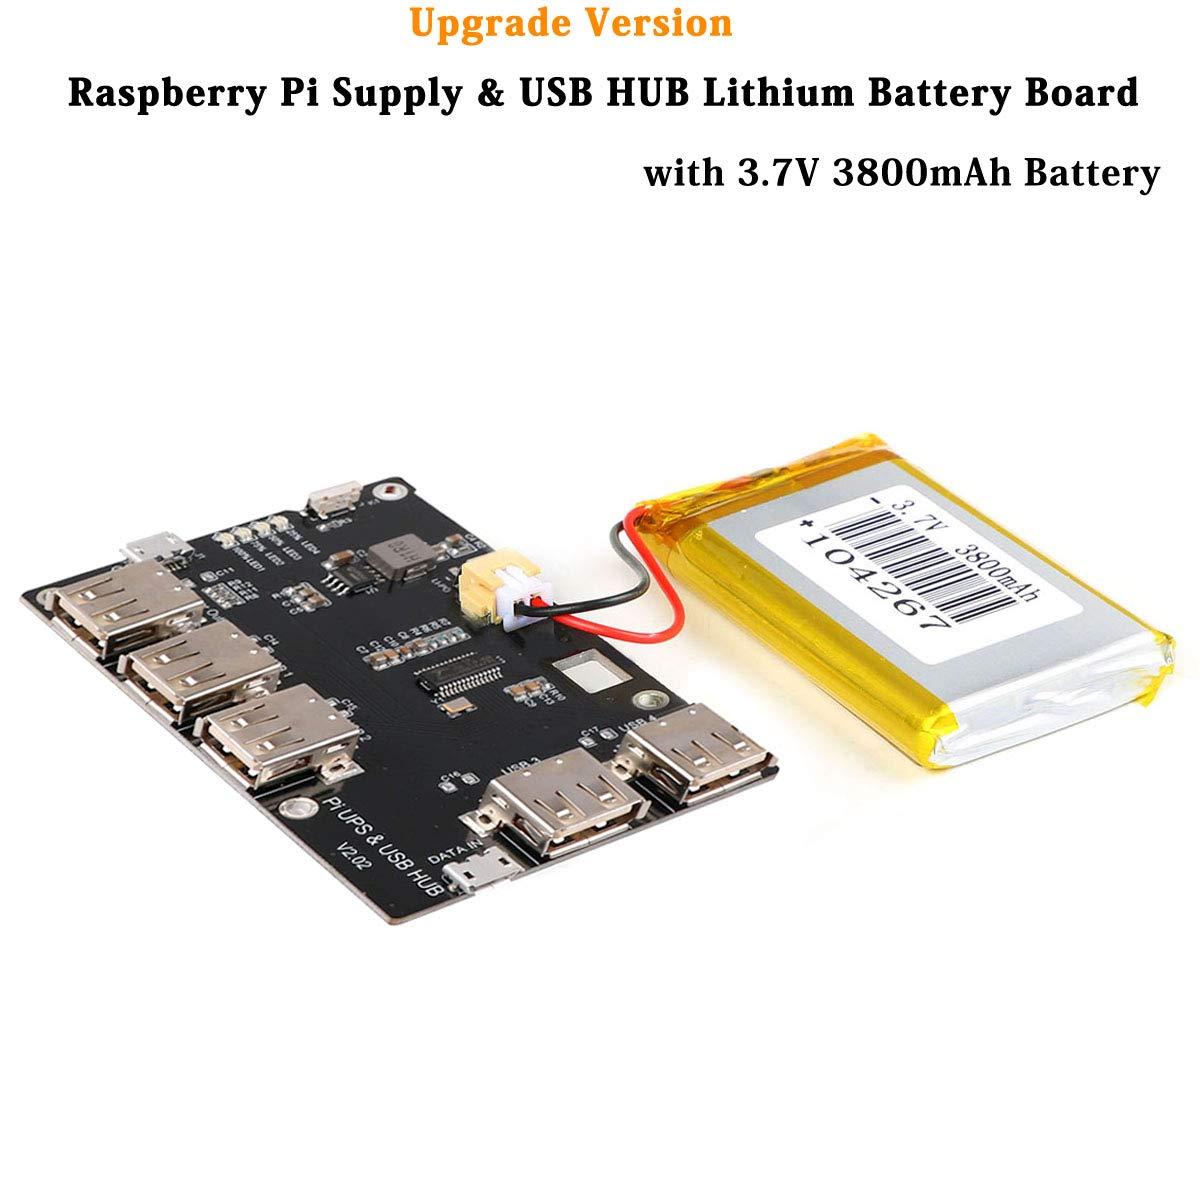 Amazon com: MakerFocus Raspberry Pi Supply & USB HUB 5 Port